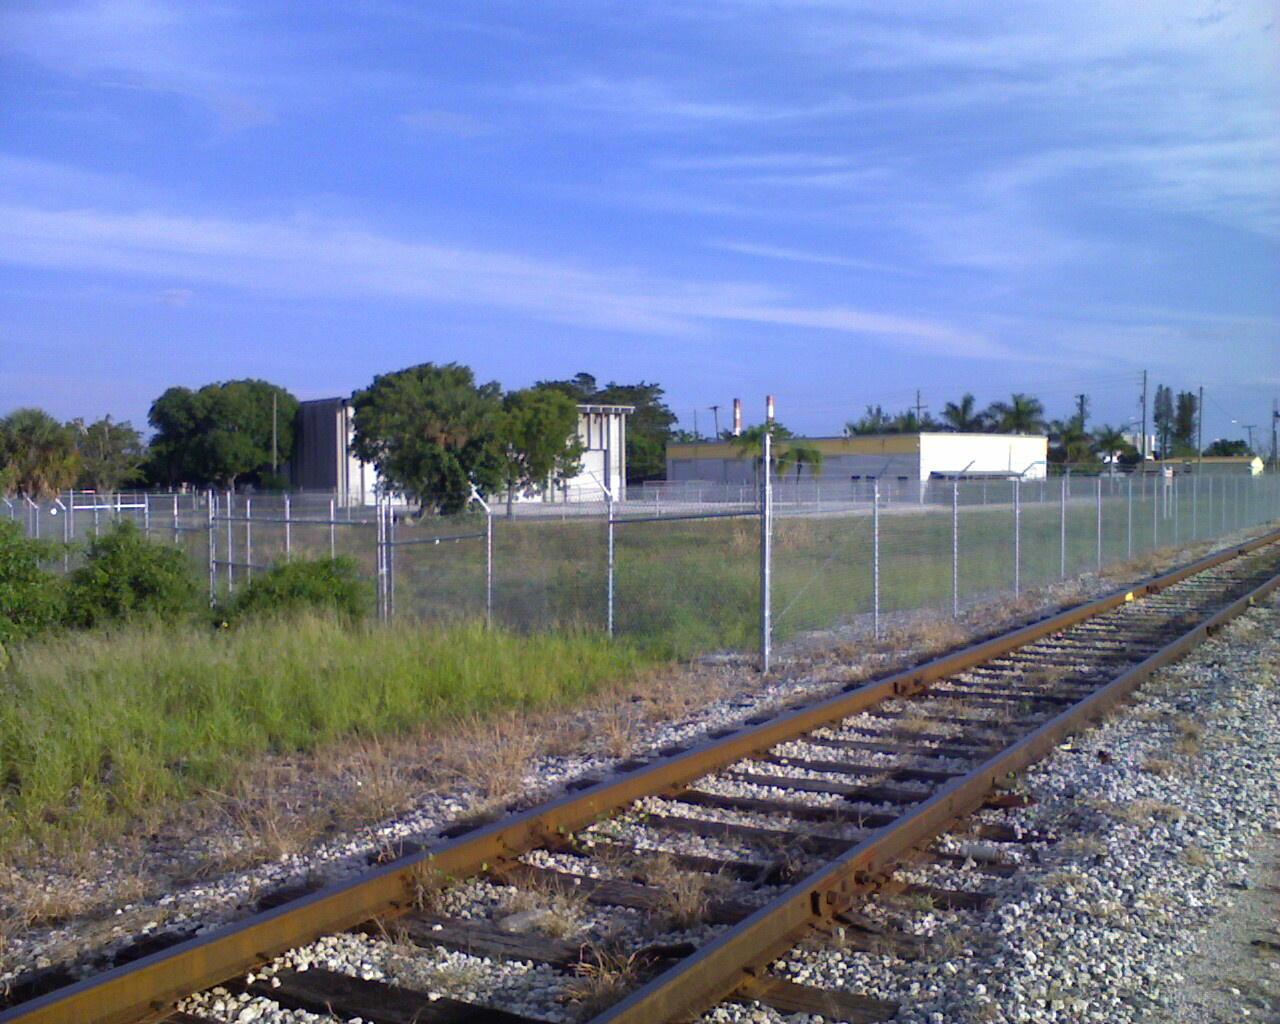 Riv Bch Fence 100509_003